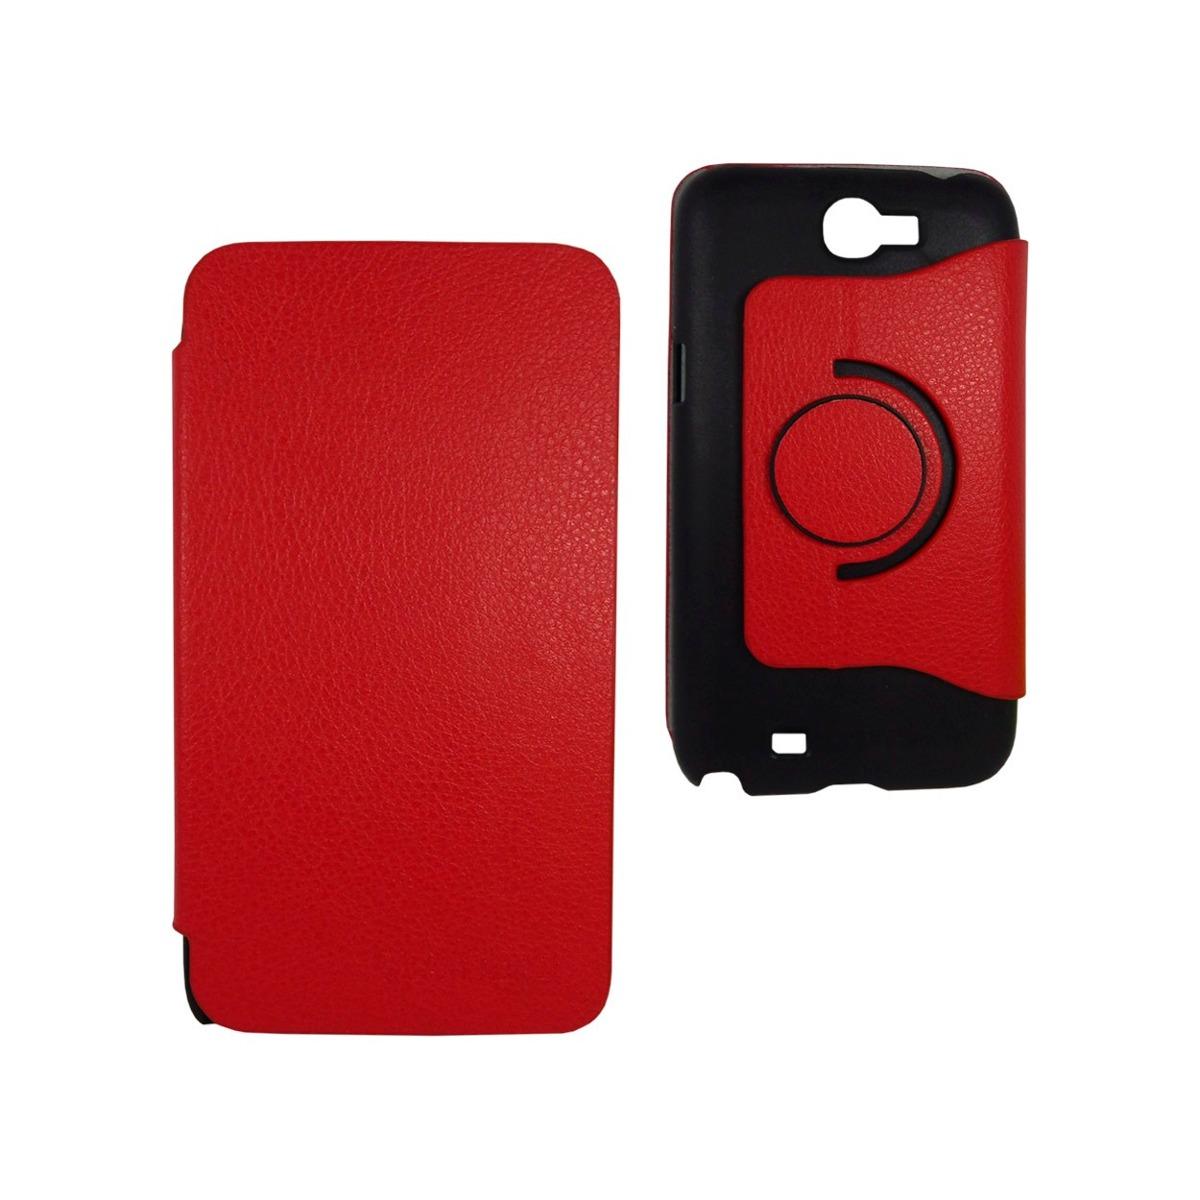 Samsung galaxy note 2 funda giratoria flip cover stand rojo en mercadolibre - Note 2 fundas ...